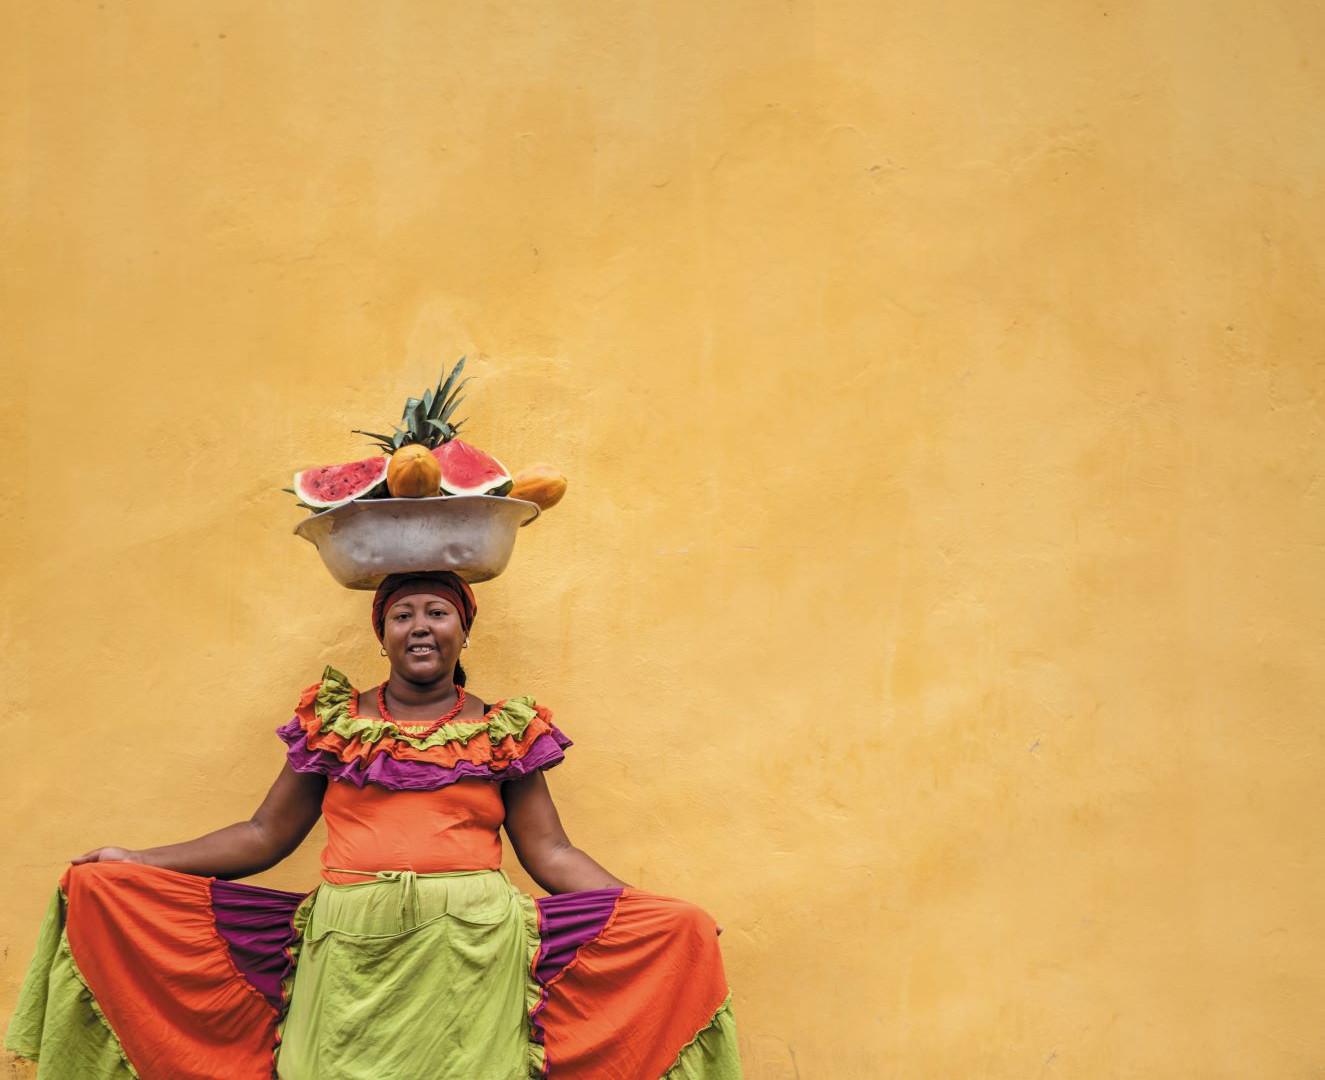 Cartagena - Local woman